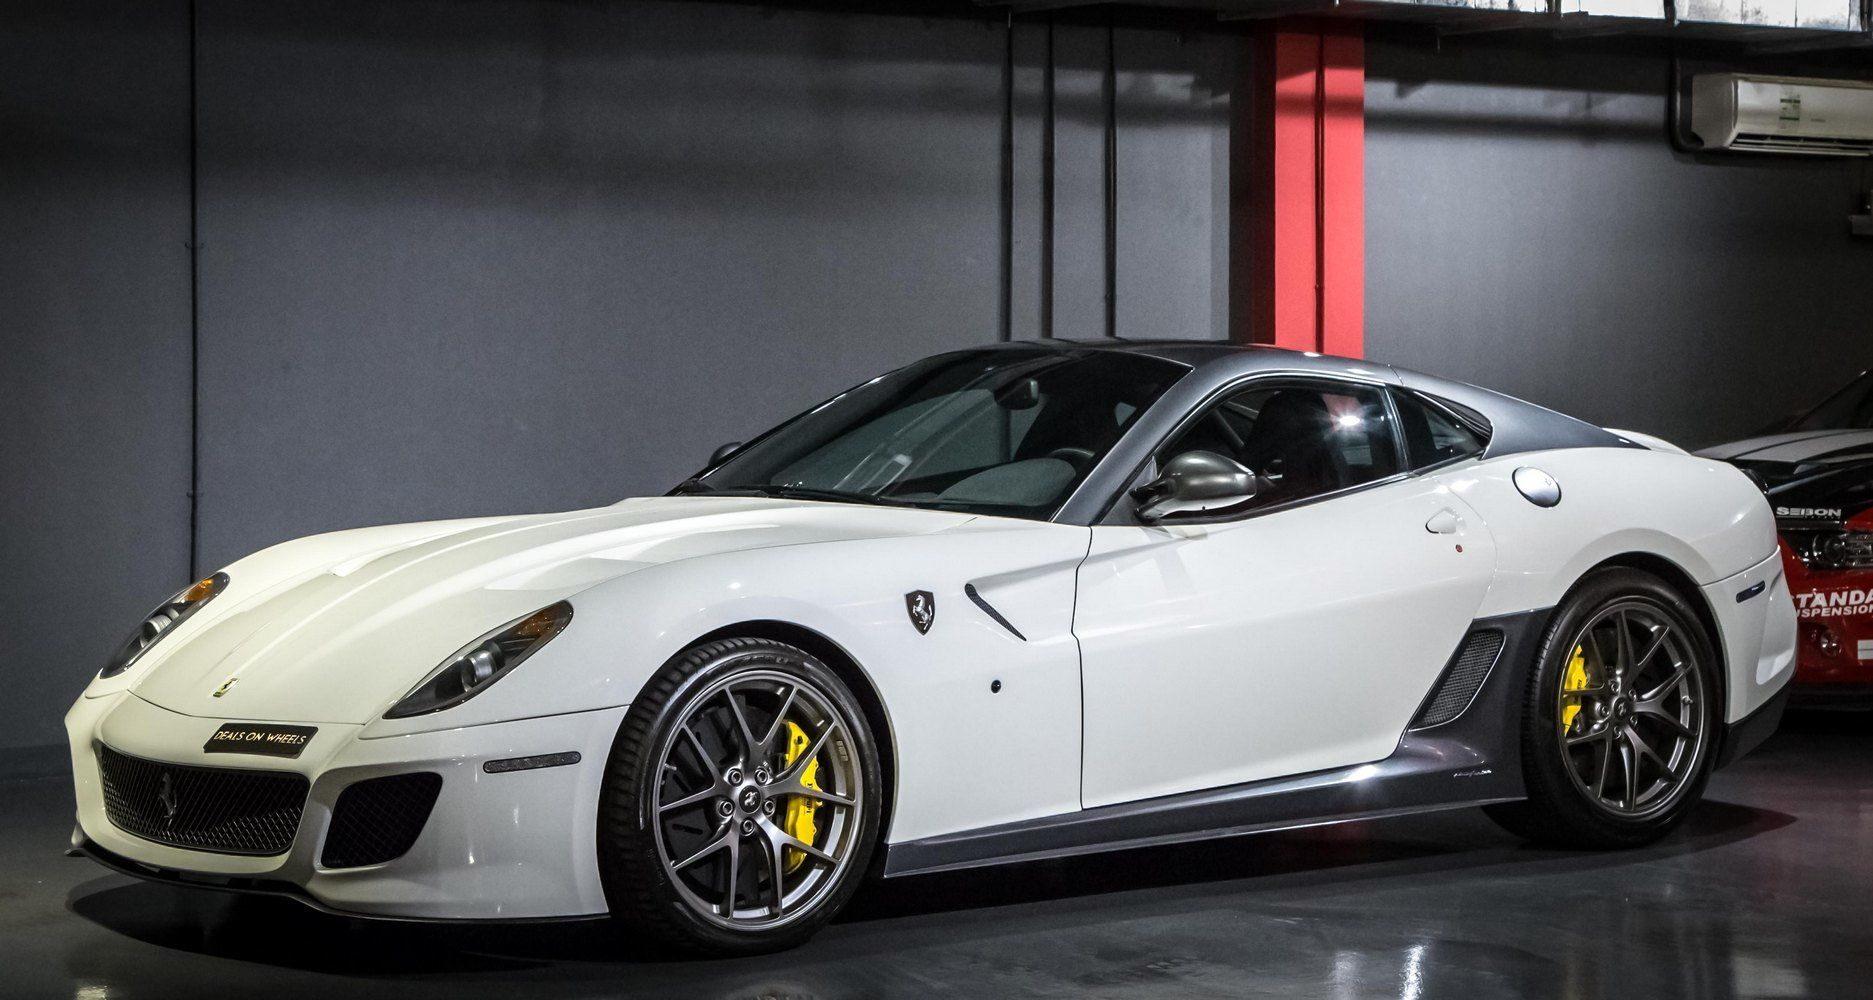 2011 Ferrari 599 GTO 1 of 599 | Dubai uae, Ferrari and Wheels